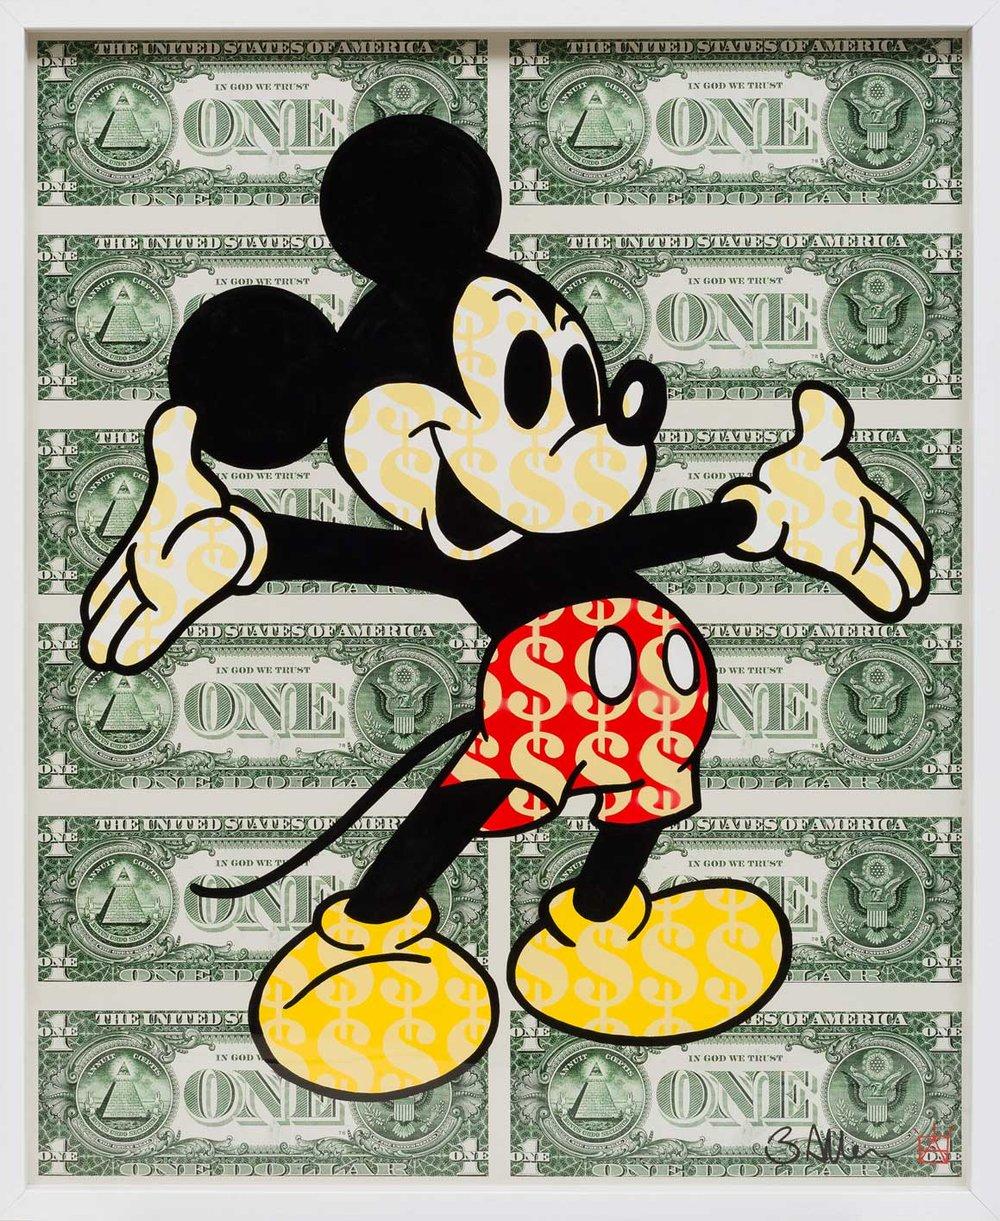 BenAllen_Monster_Mickey_Red_110cmx135cm_FRAMEDONLY_Acrylic_spraypaint_stencil_giclee_320gsmpaper_£.jpg.jpg